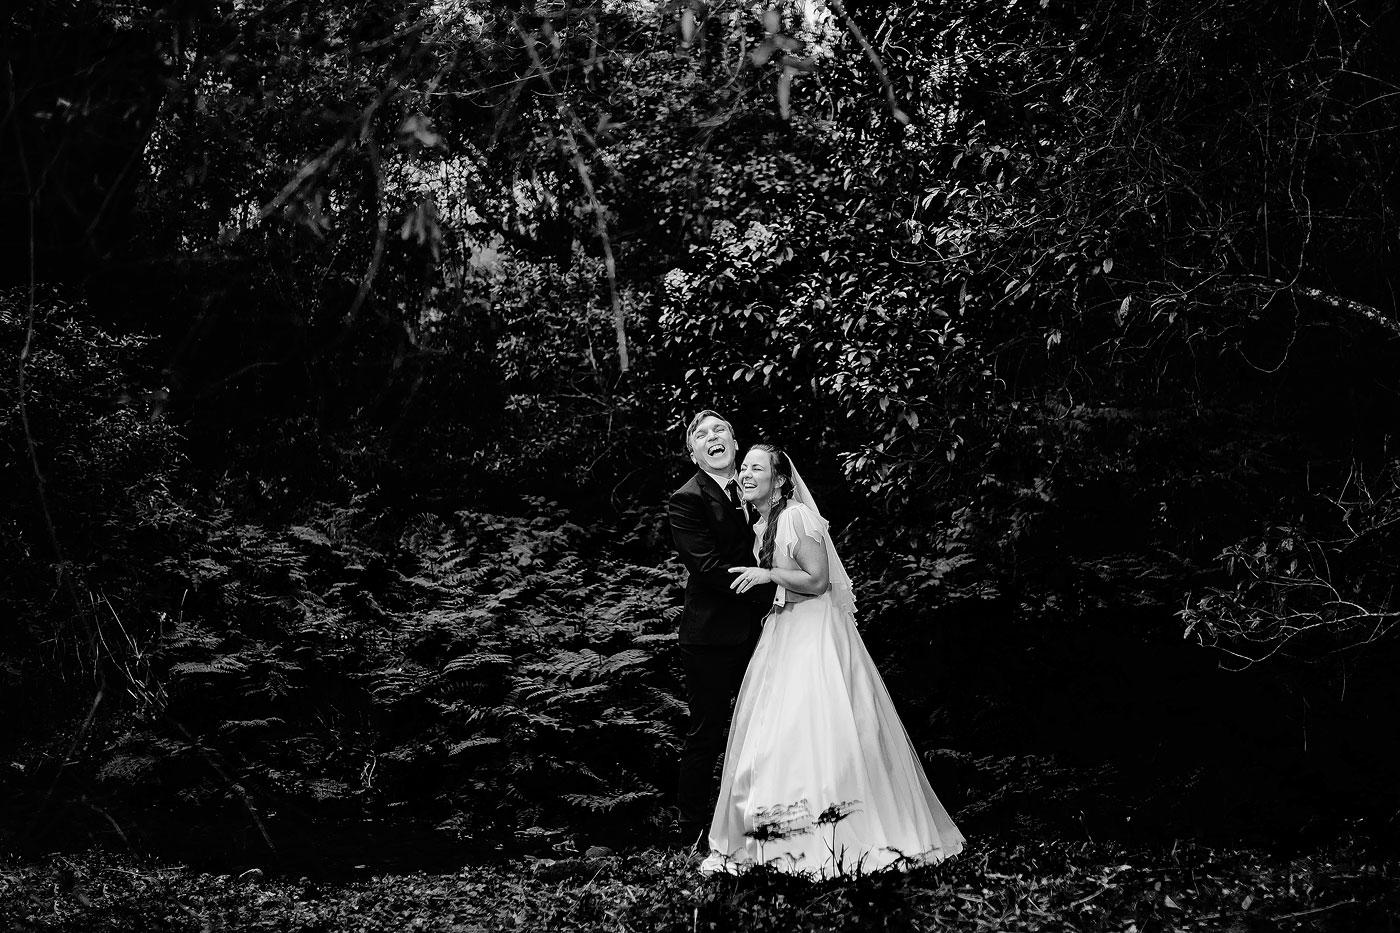 Forest Wedding Couple Shootq